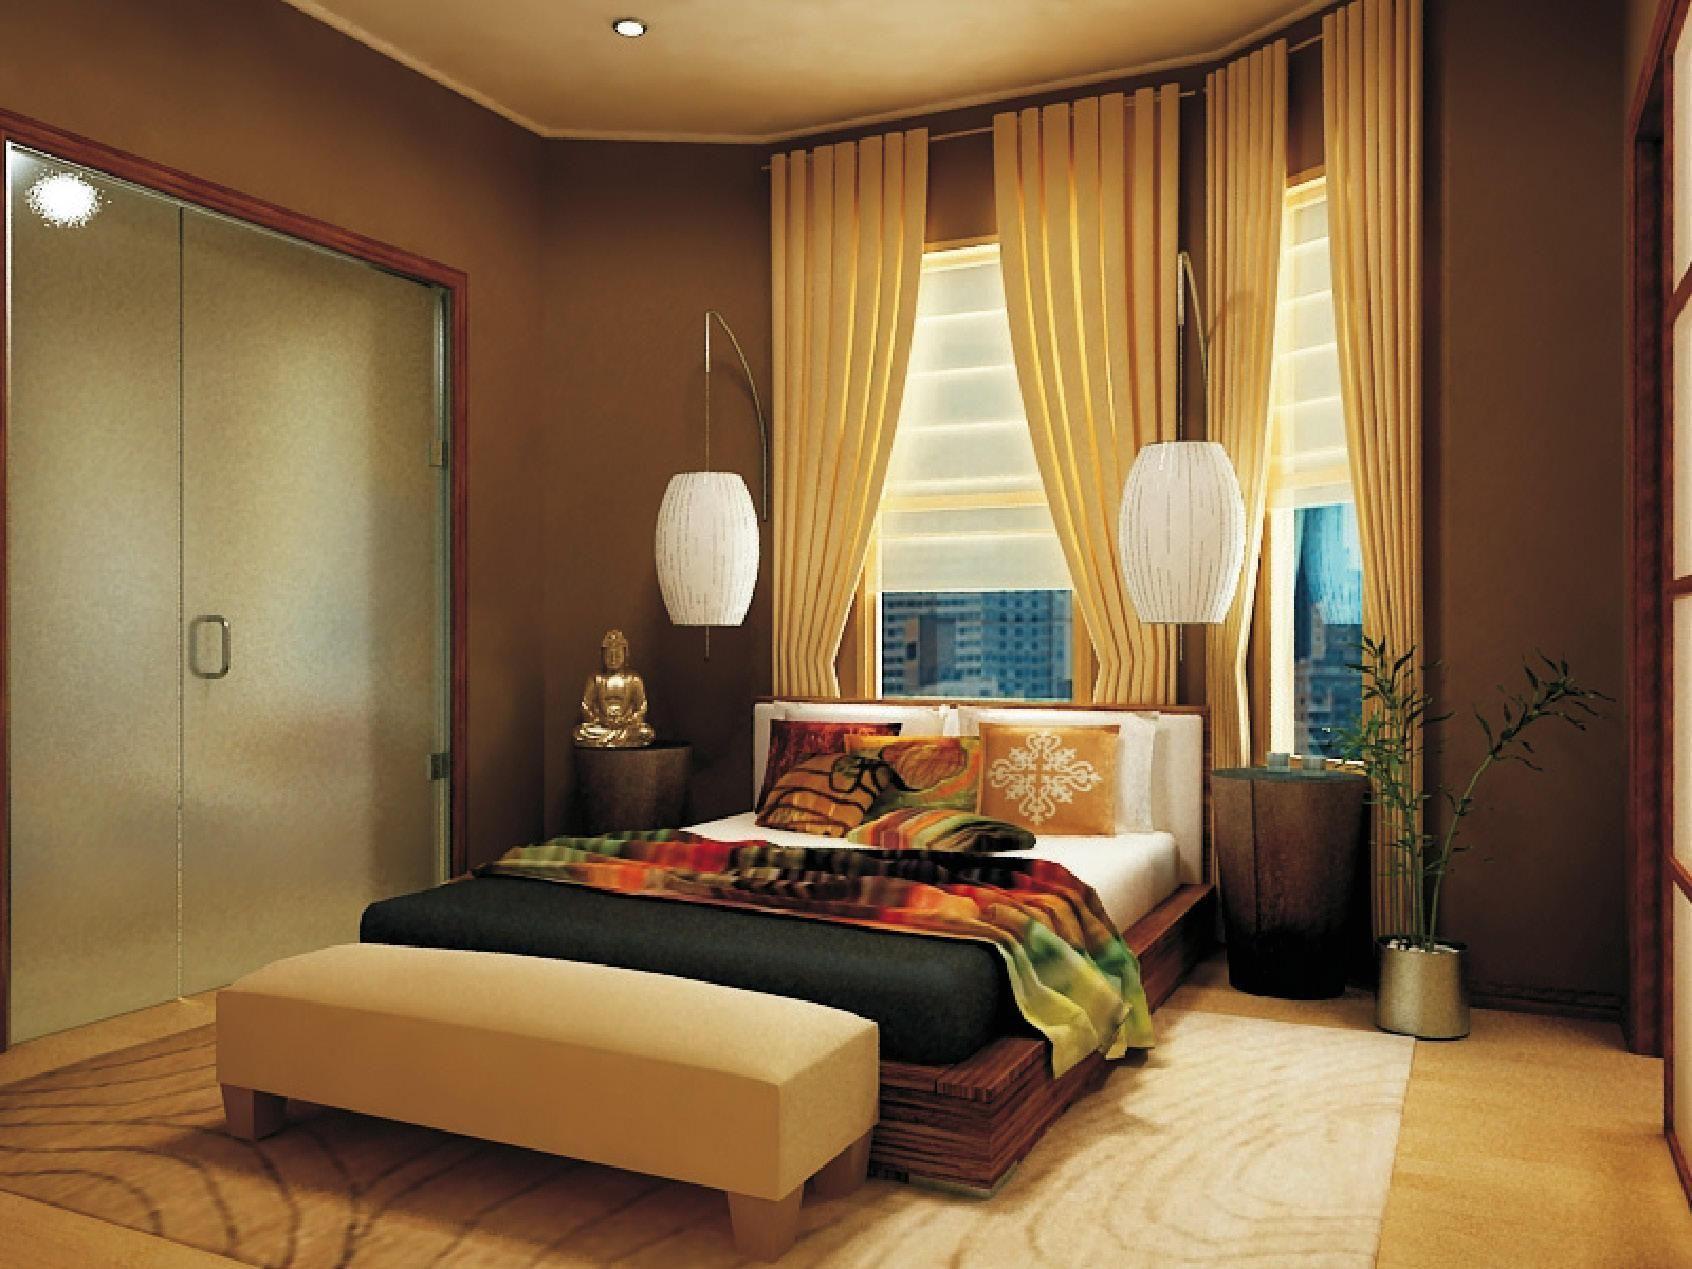 Zen Bedroom Decorating Captivating Decor Home Lighting Blog Archive Feng Shui In Your Design 2968 Dsgnbook